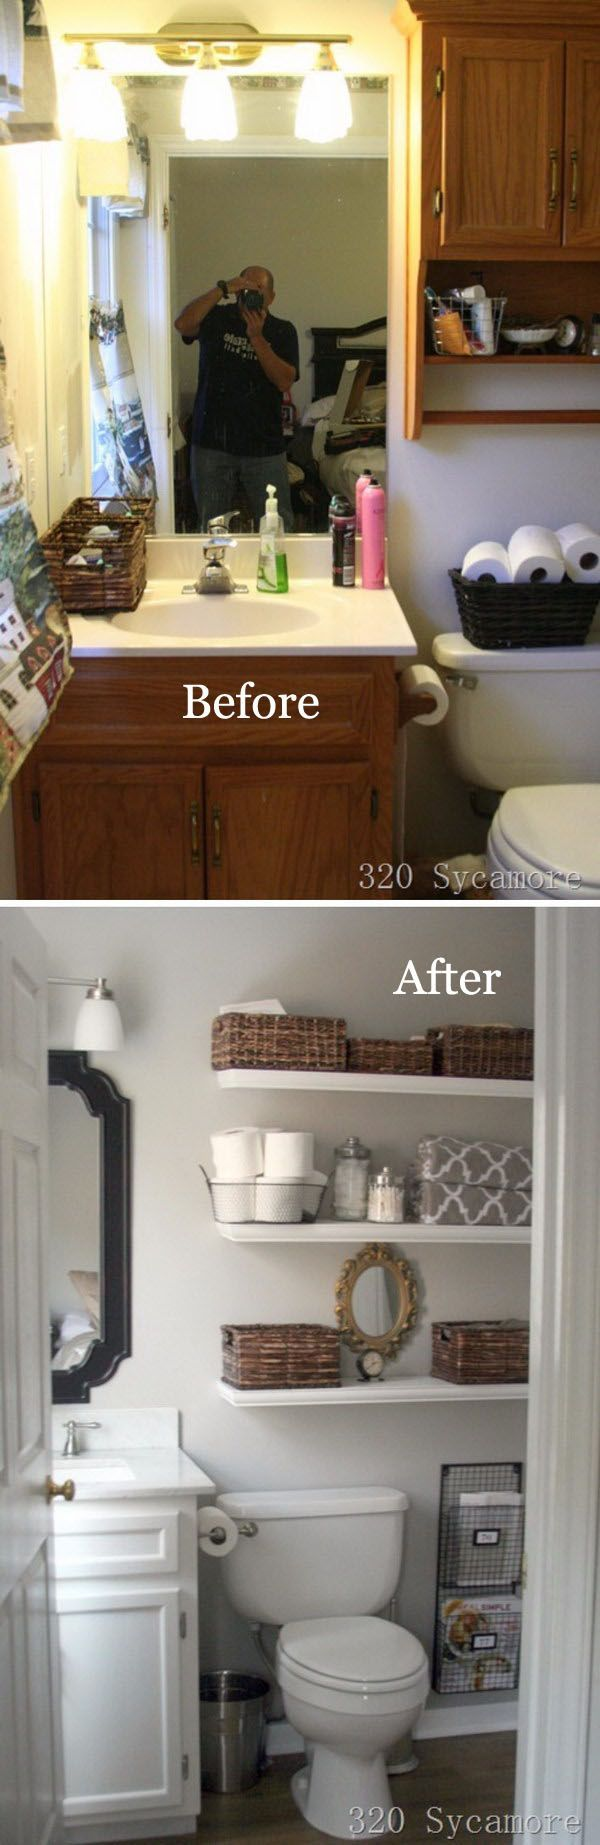 Diy bathroom makeover ideas - 37 Small Bathroom Makeovers